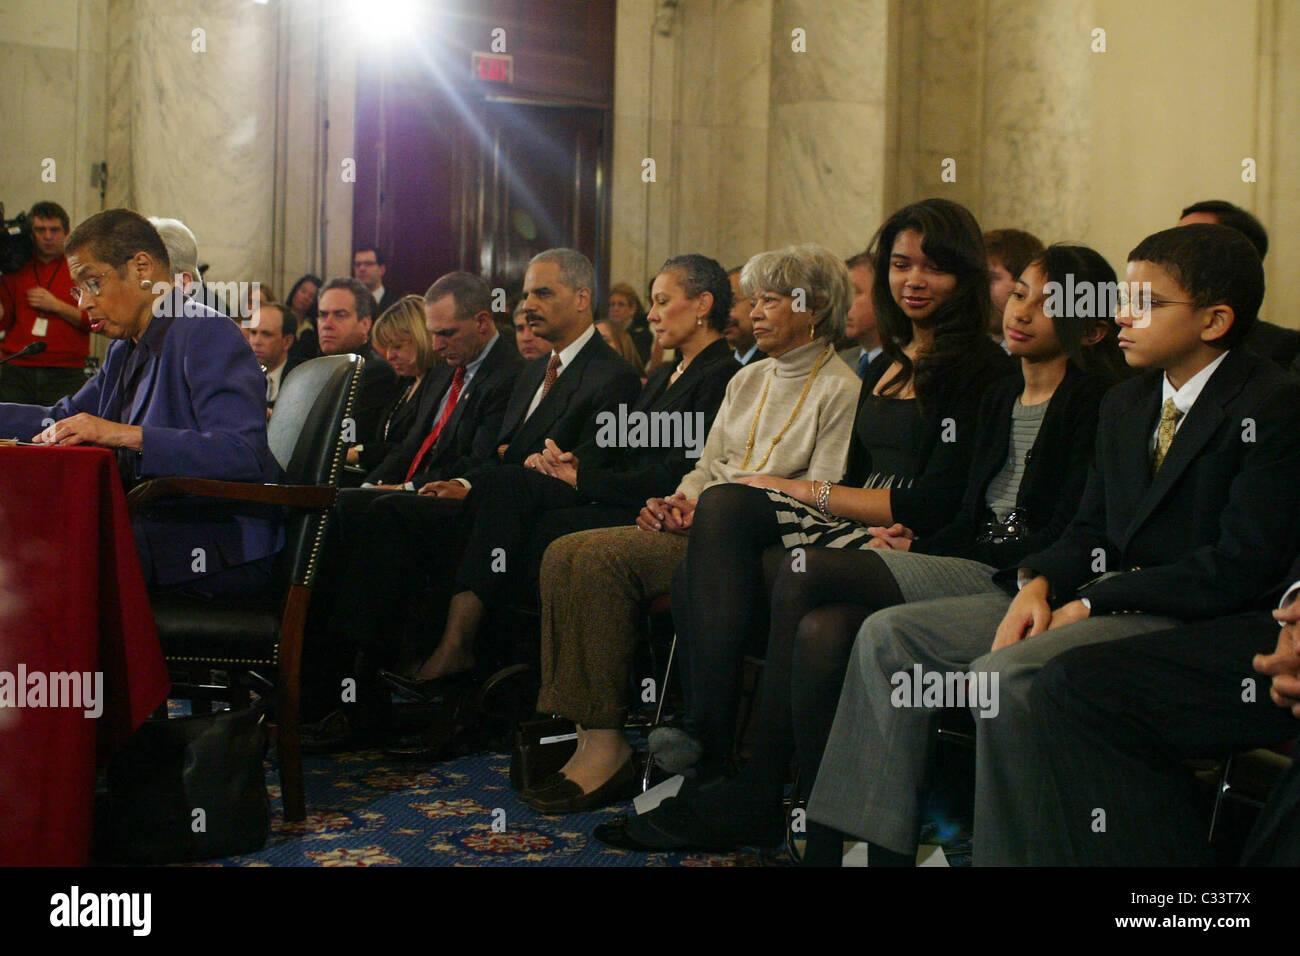 Senator Dianne Feinstein, Eric Holder, and family The Senate Judiciary Committee hearing for Eric Holder, President - Stock Image